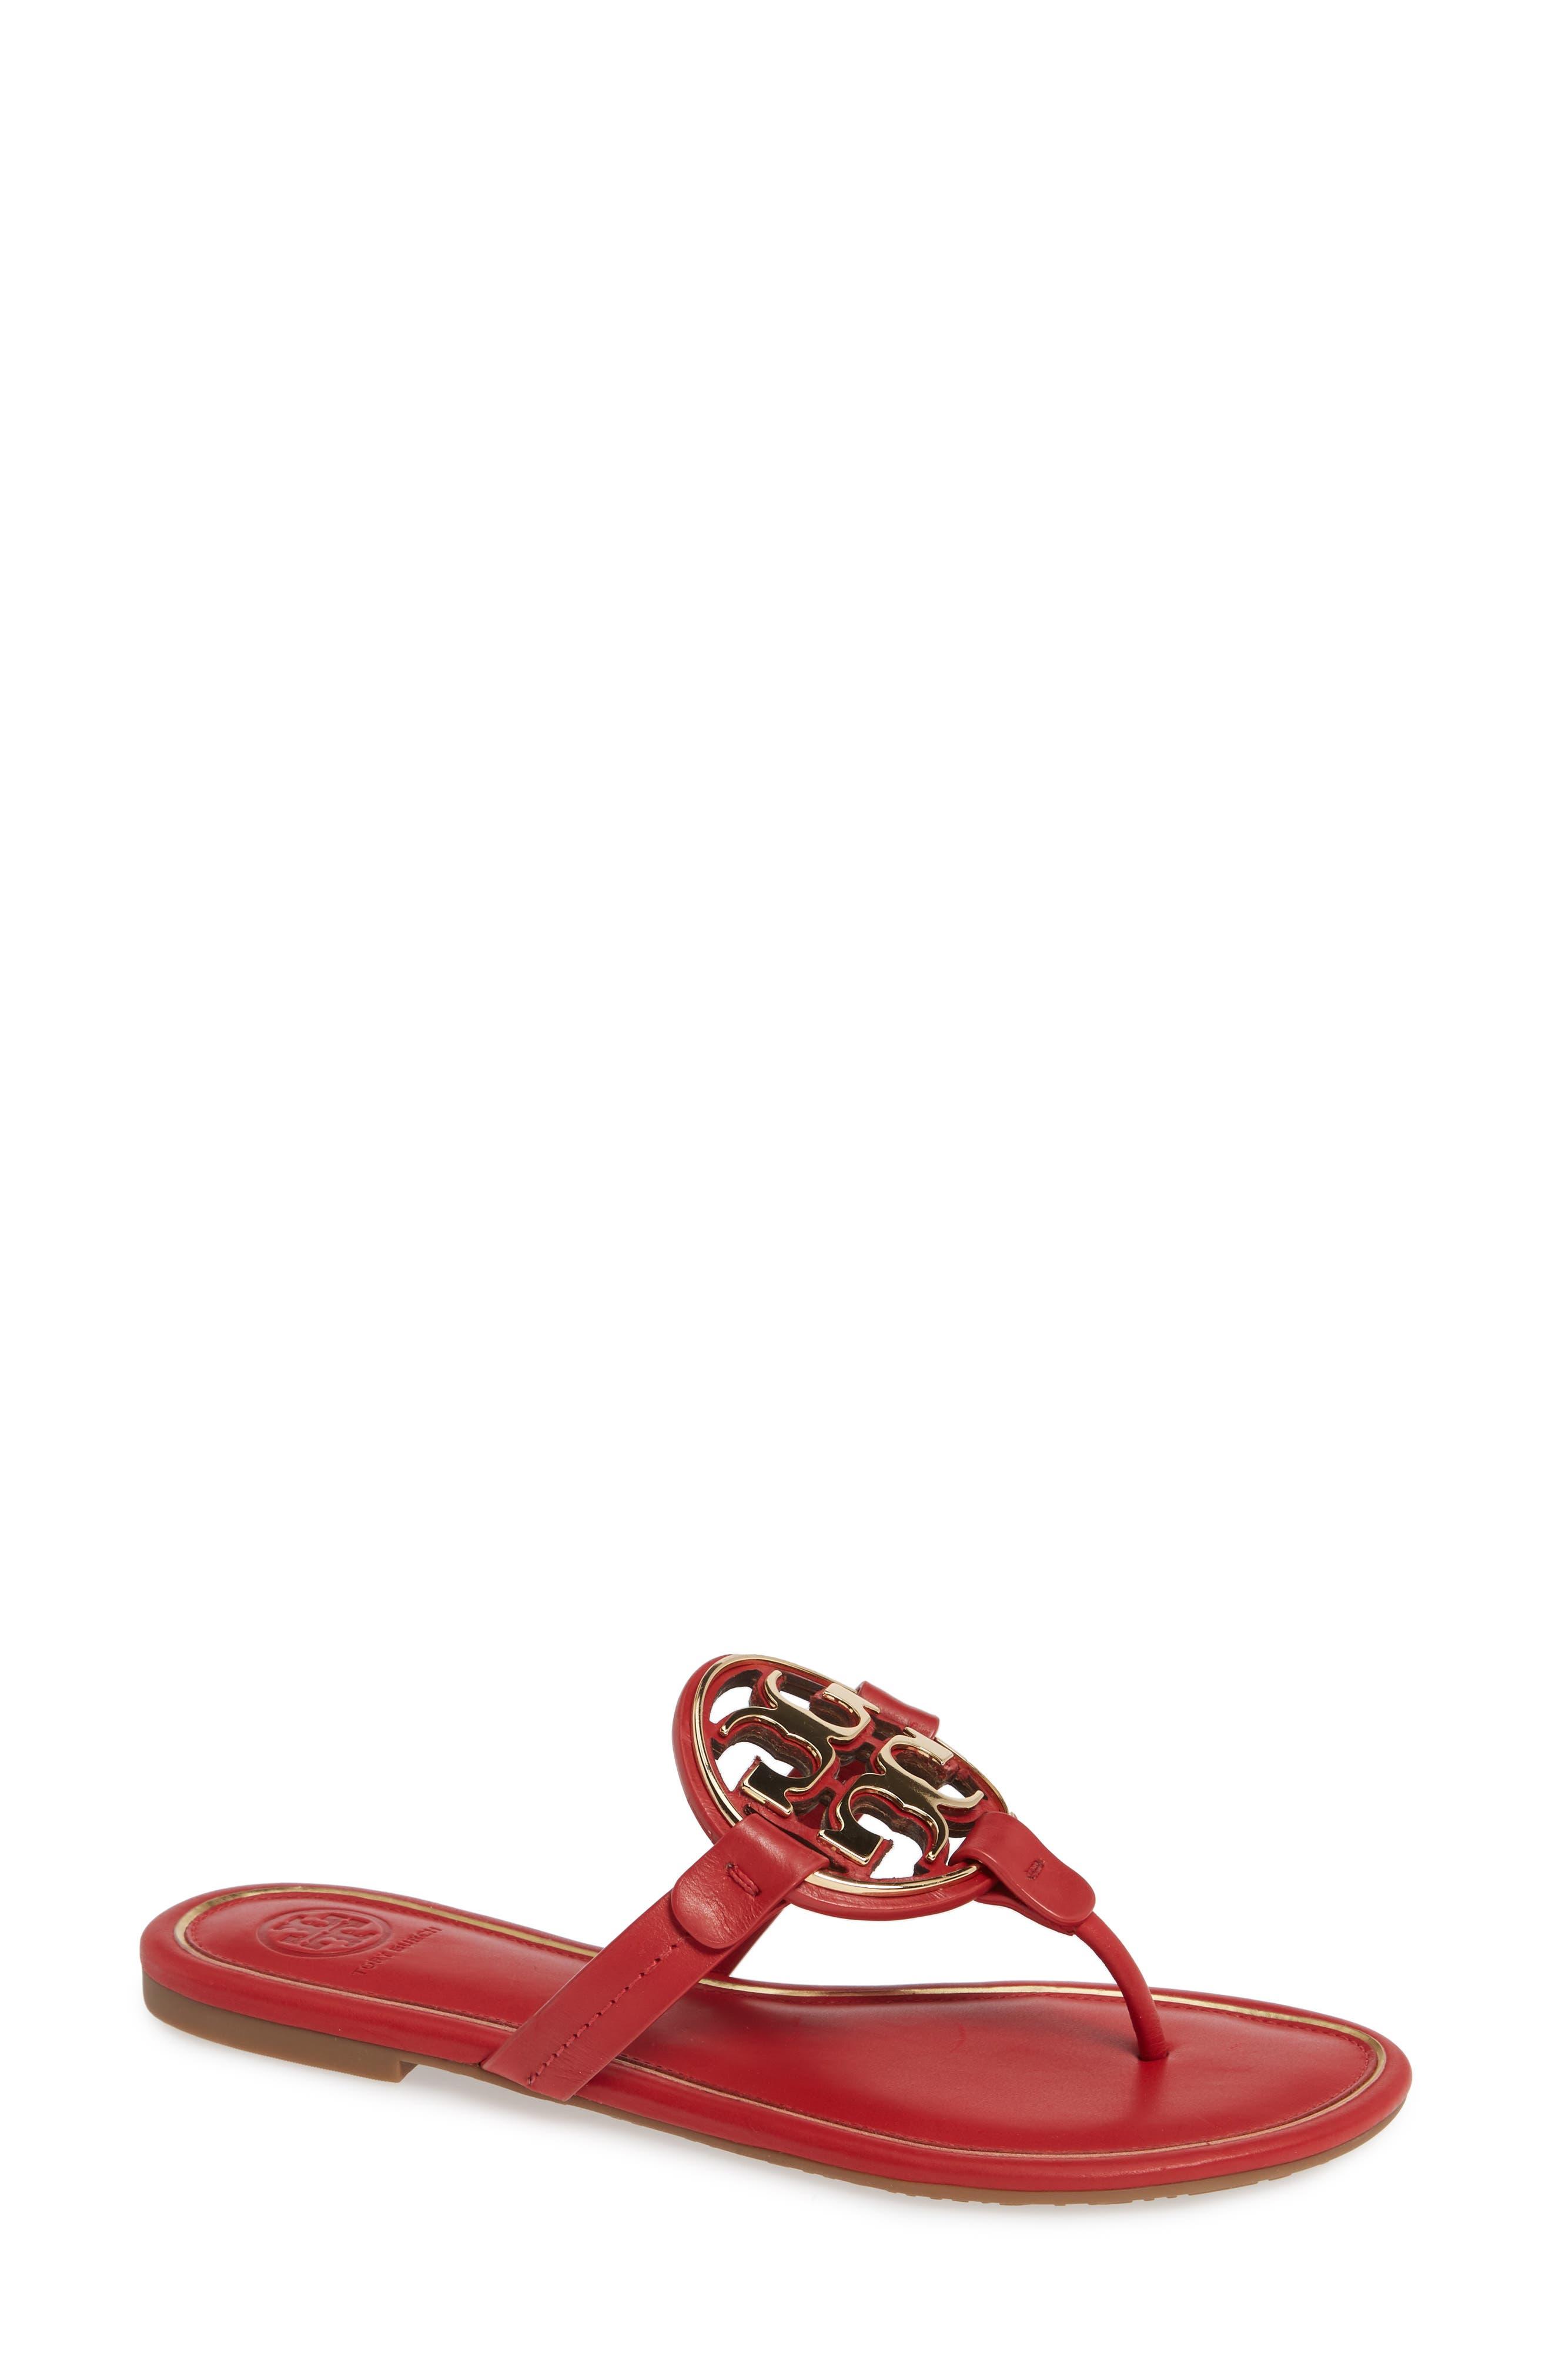 dad19f025c19 tory burch miller sandal